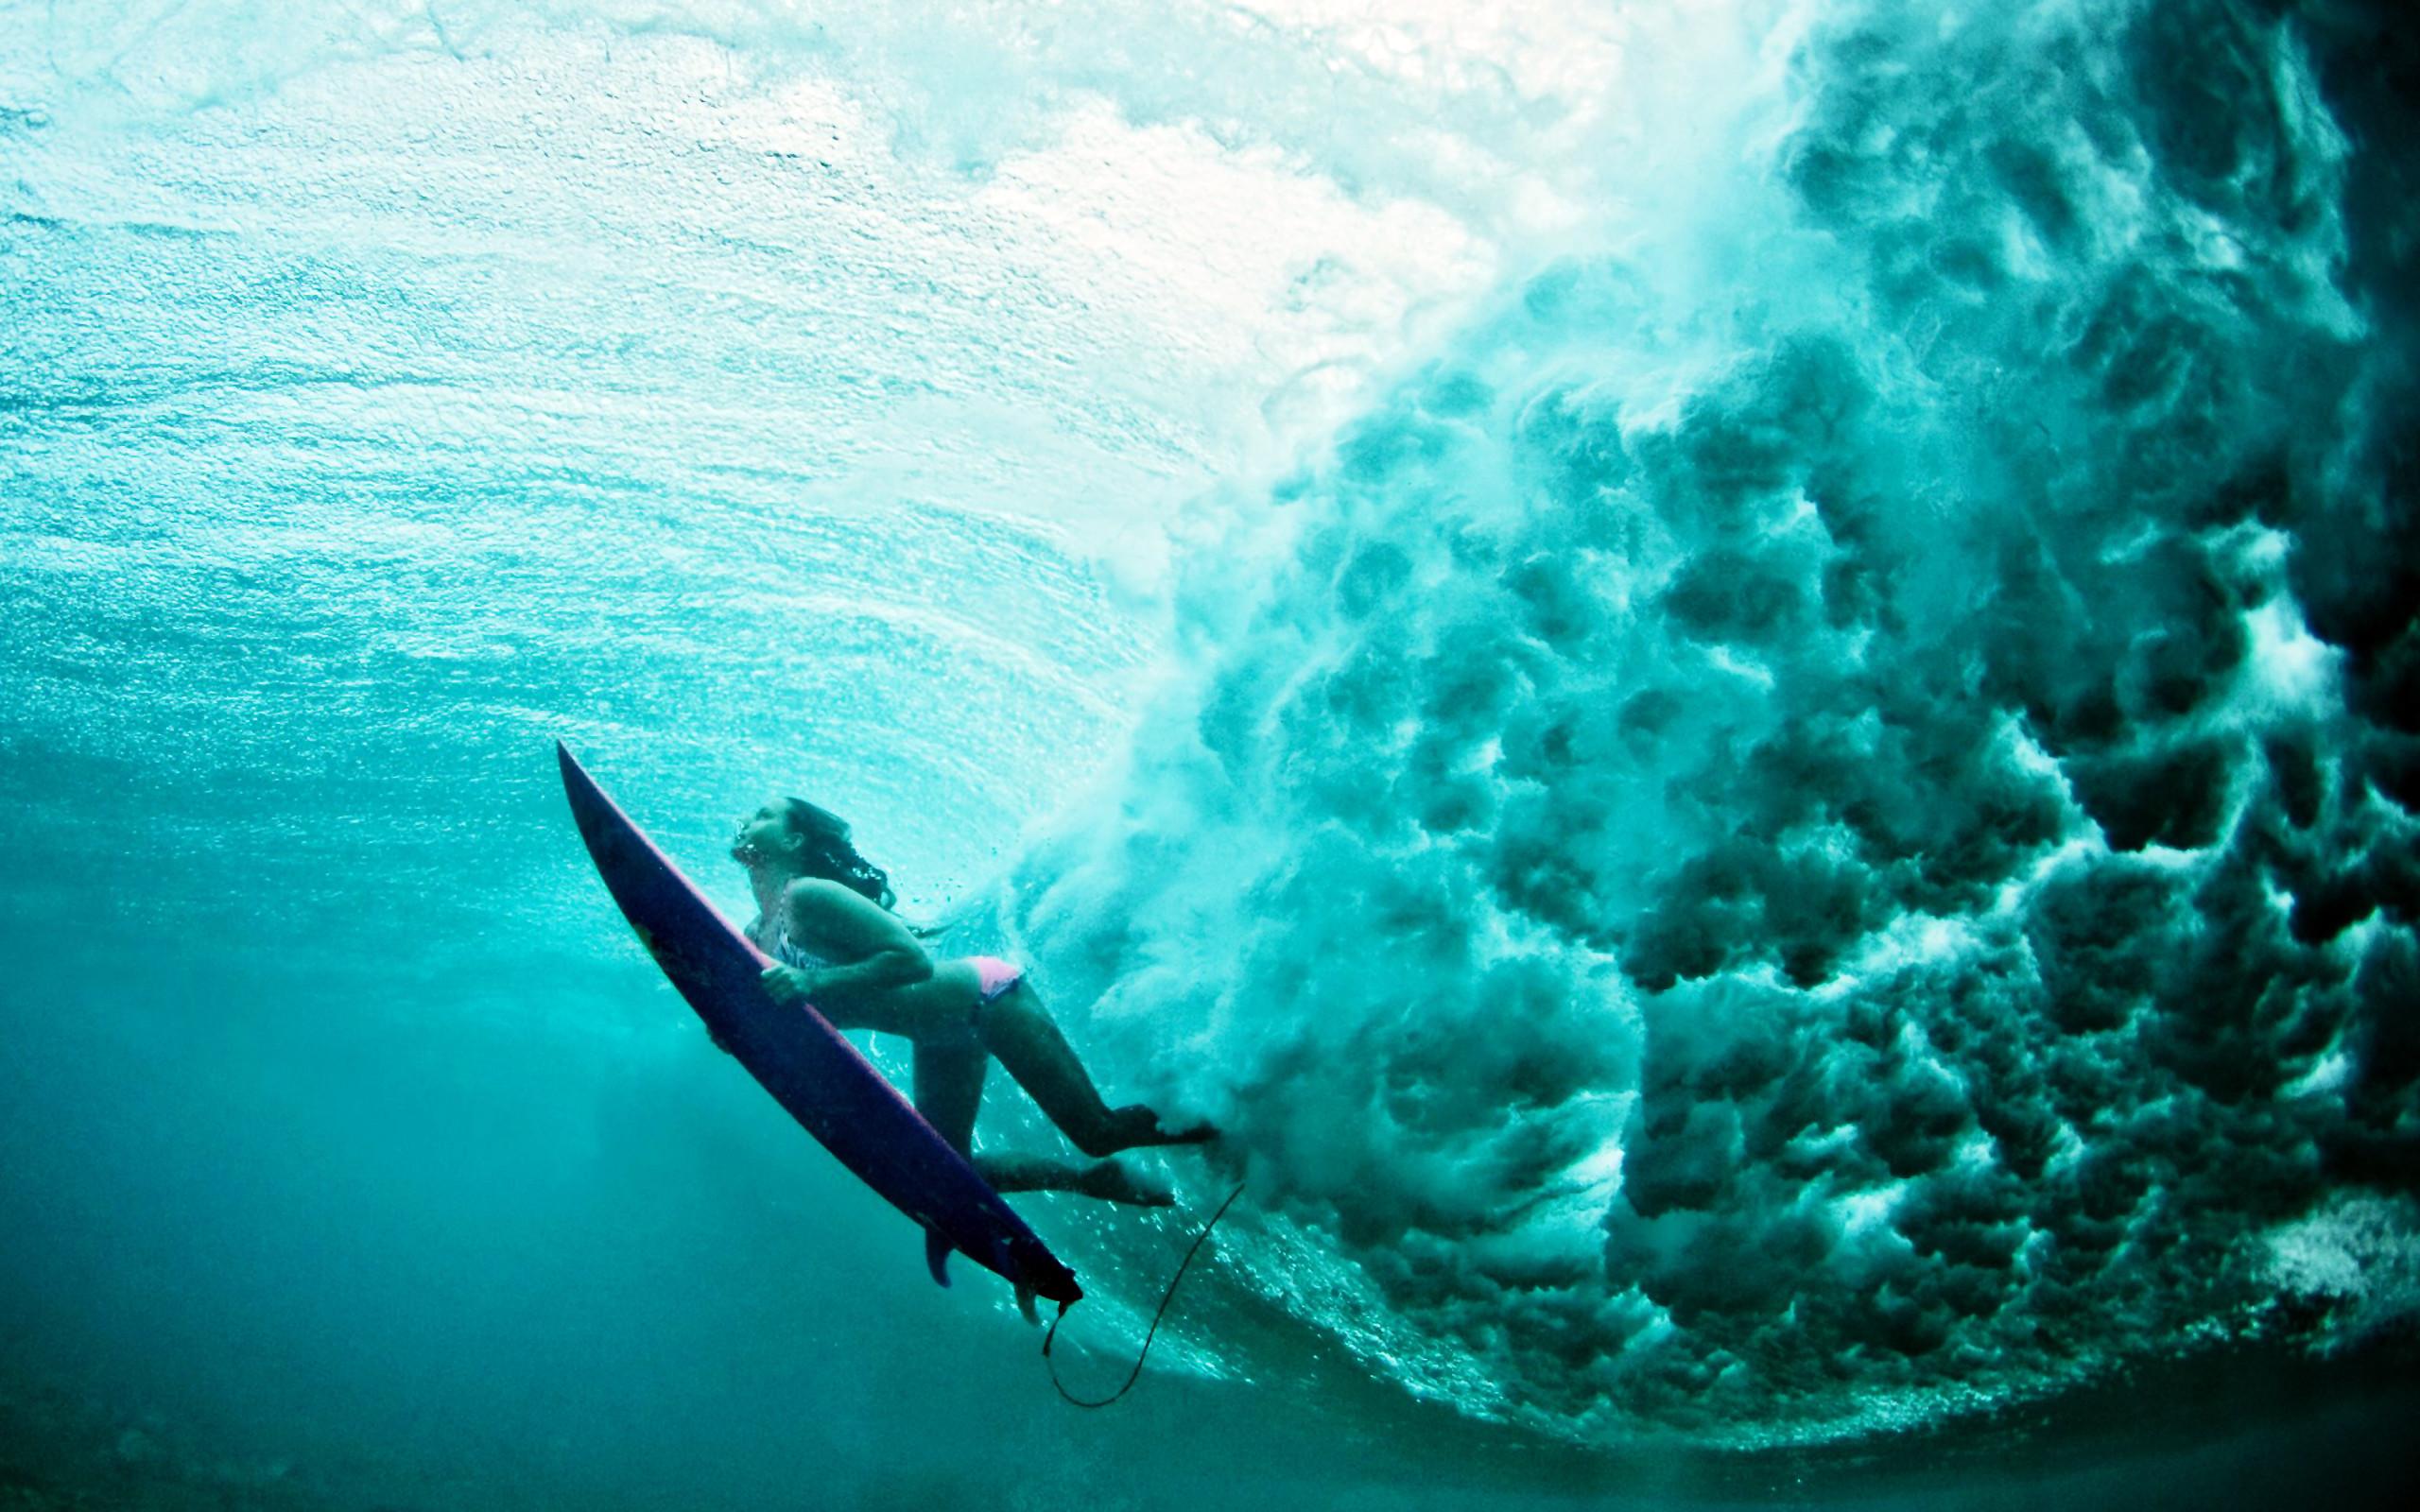 Underwater surf girl wallpaper – Fondo de Pantalla – Wallpapers .